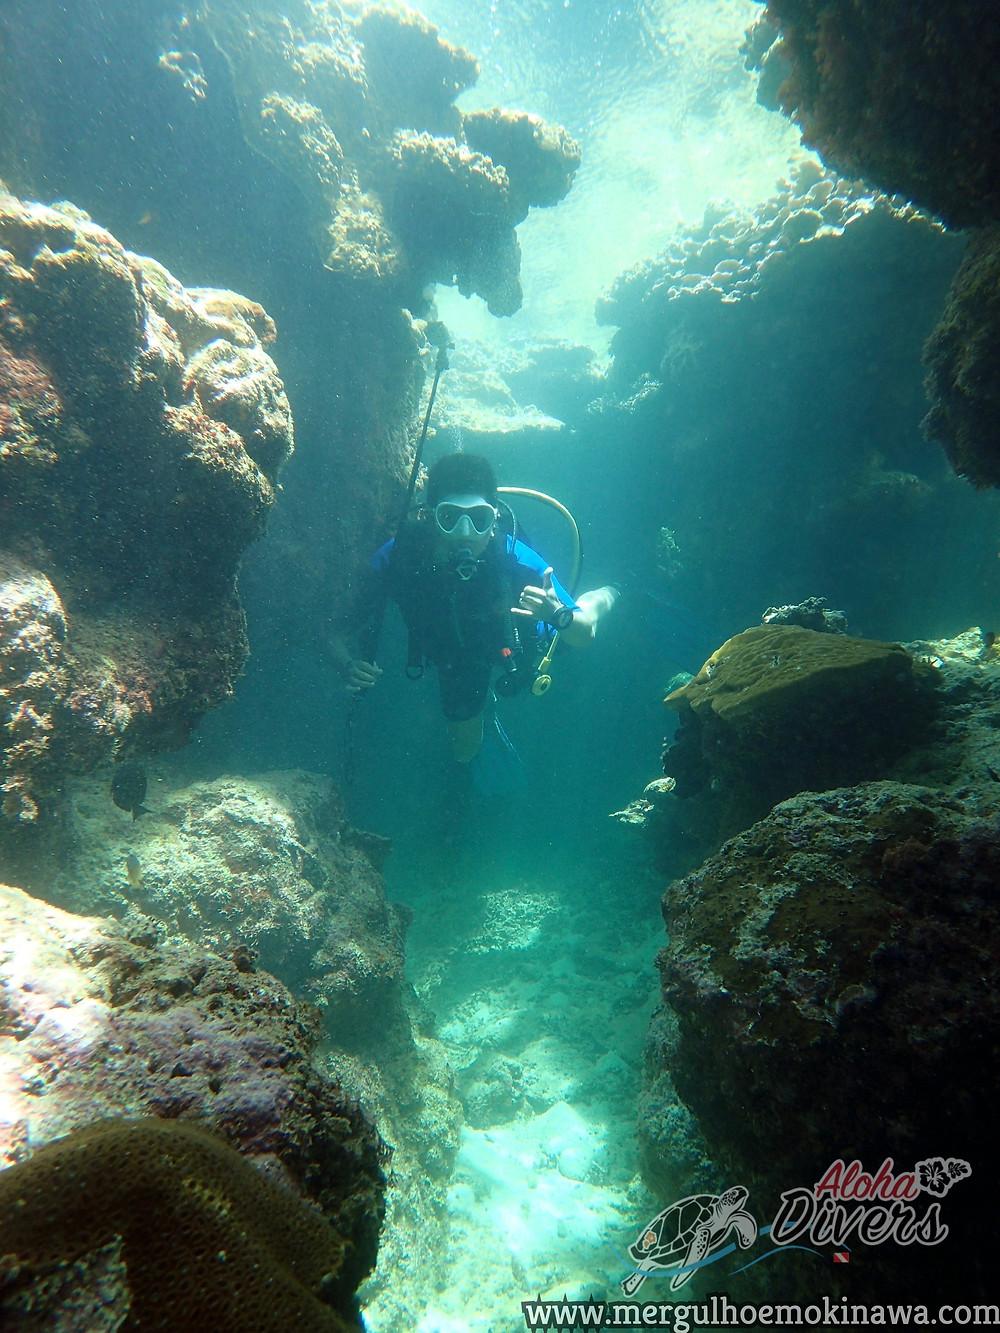 Fun Diver in Kerama - Aloha Divers Okinawa - Mergulho em Okinawa